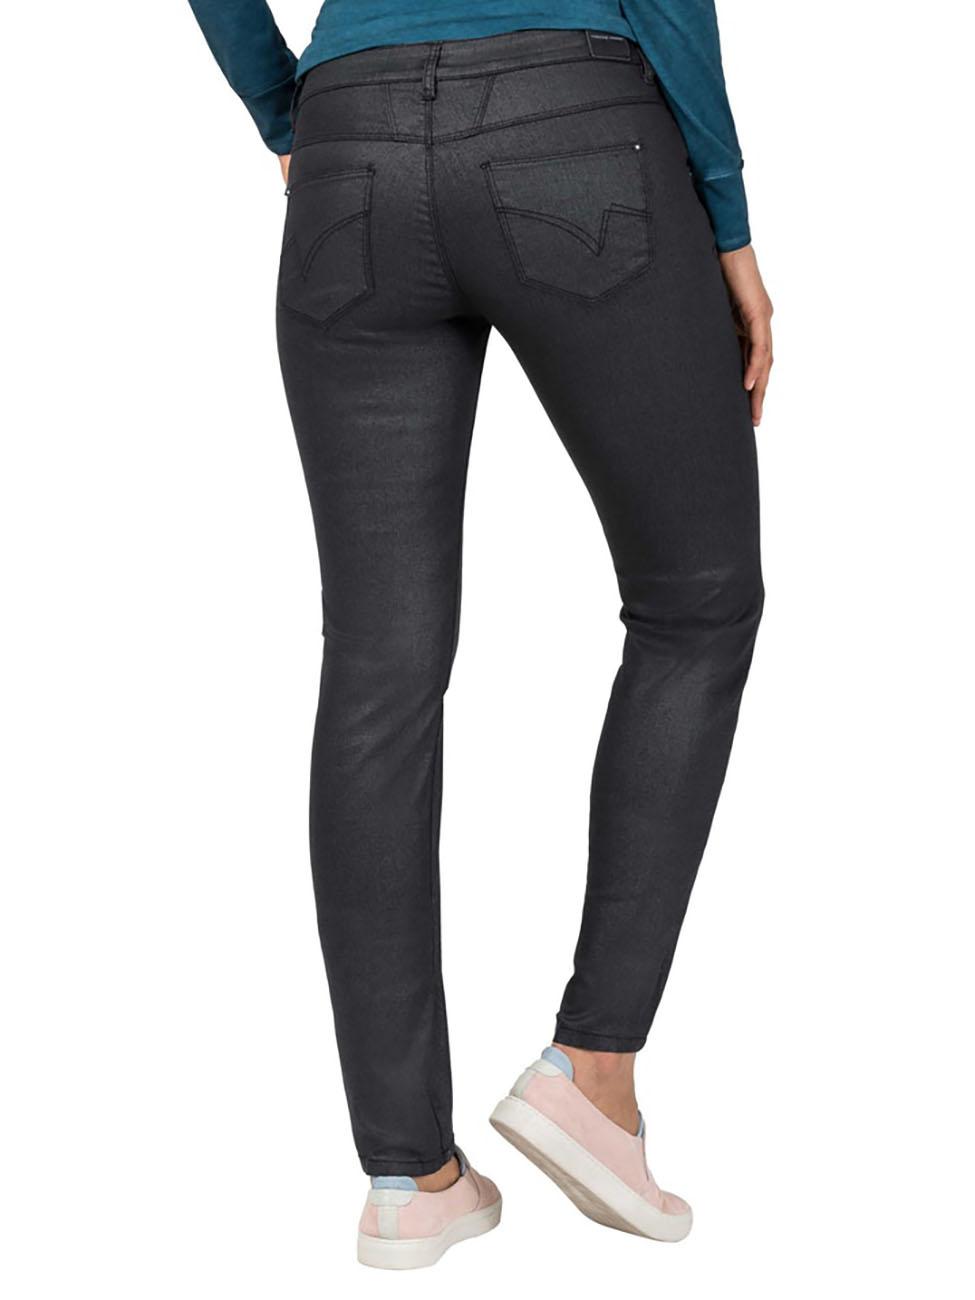 timezone-damen-jeans-sadetz-slim-fit-schwarz-black-shiny-wash